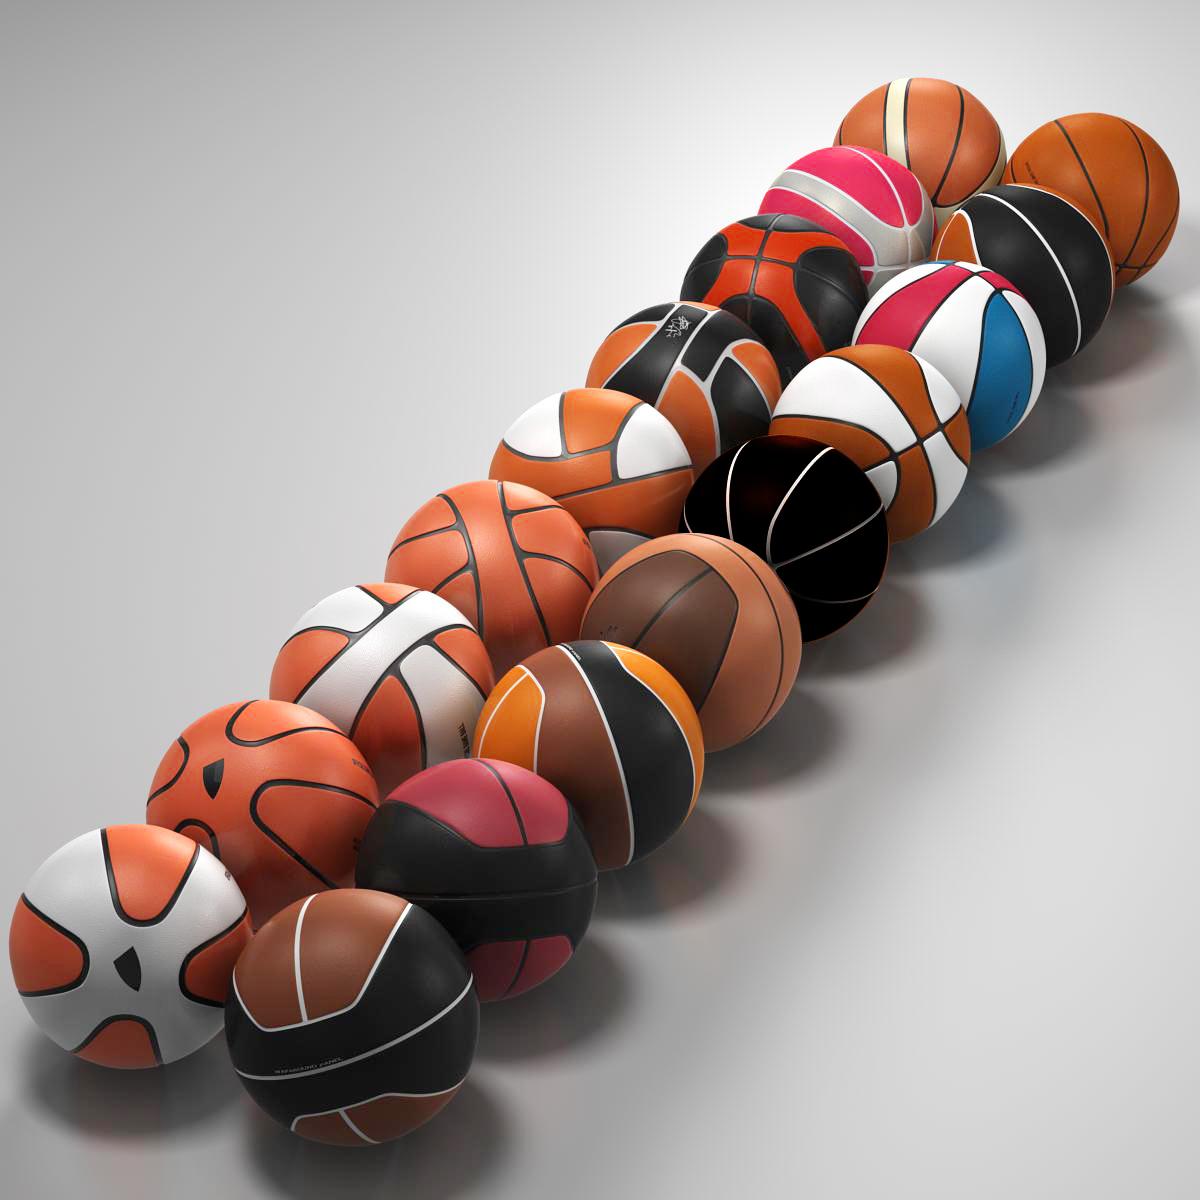 basketbola bumbu komplekts 3d modelis 3ds max fbx c4d ma mb obj 165933